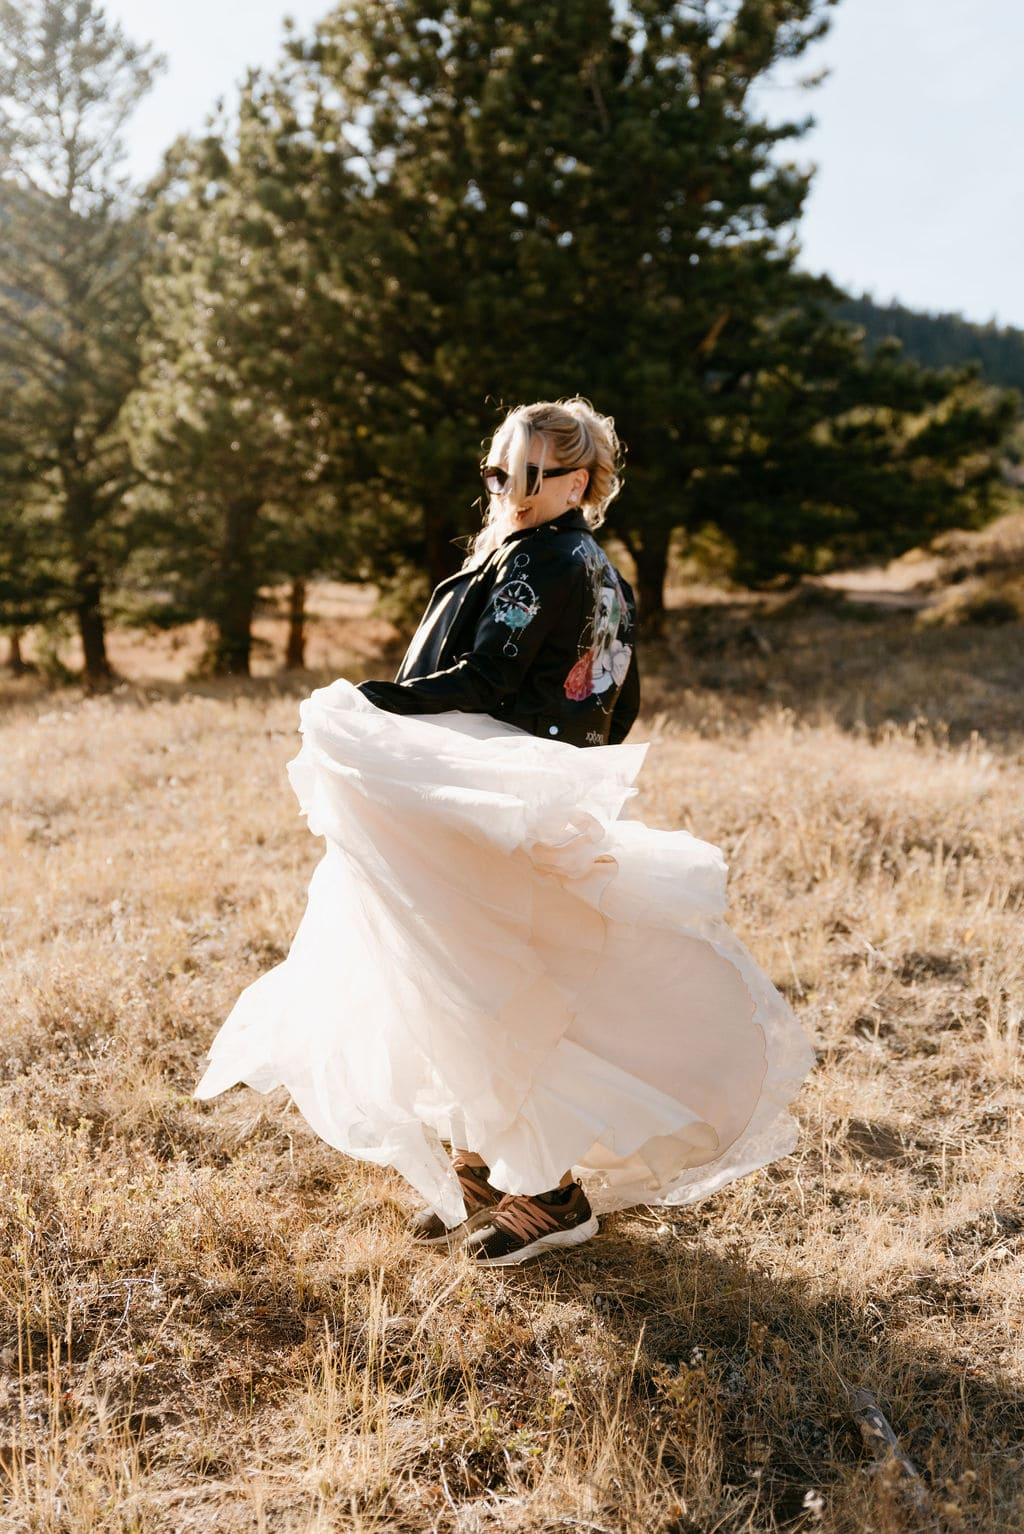 Bride spins in her dress